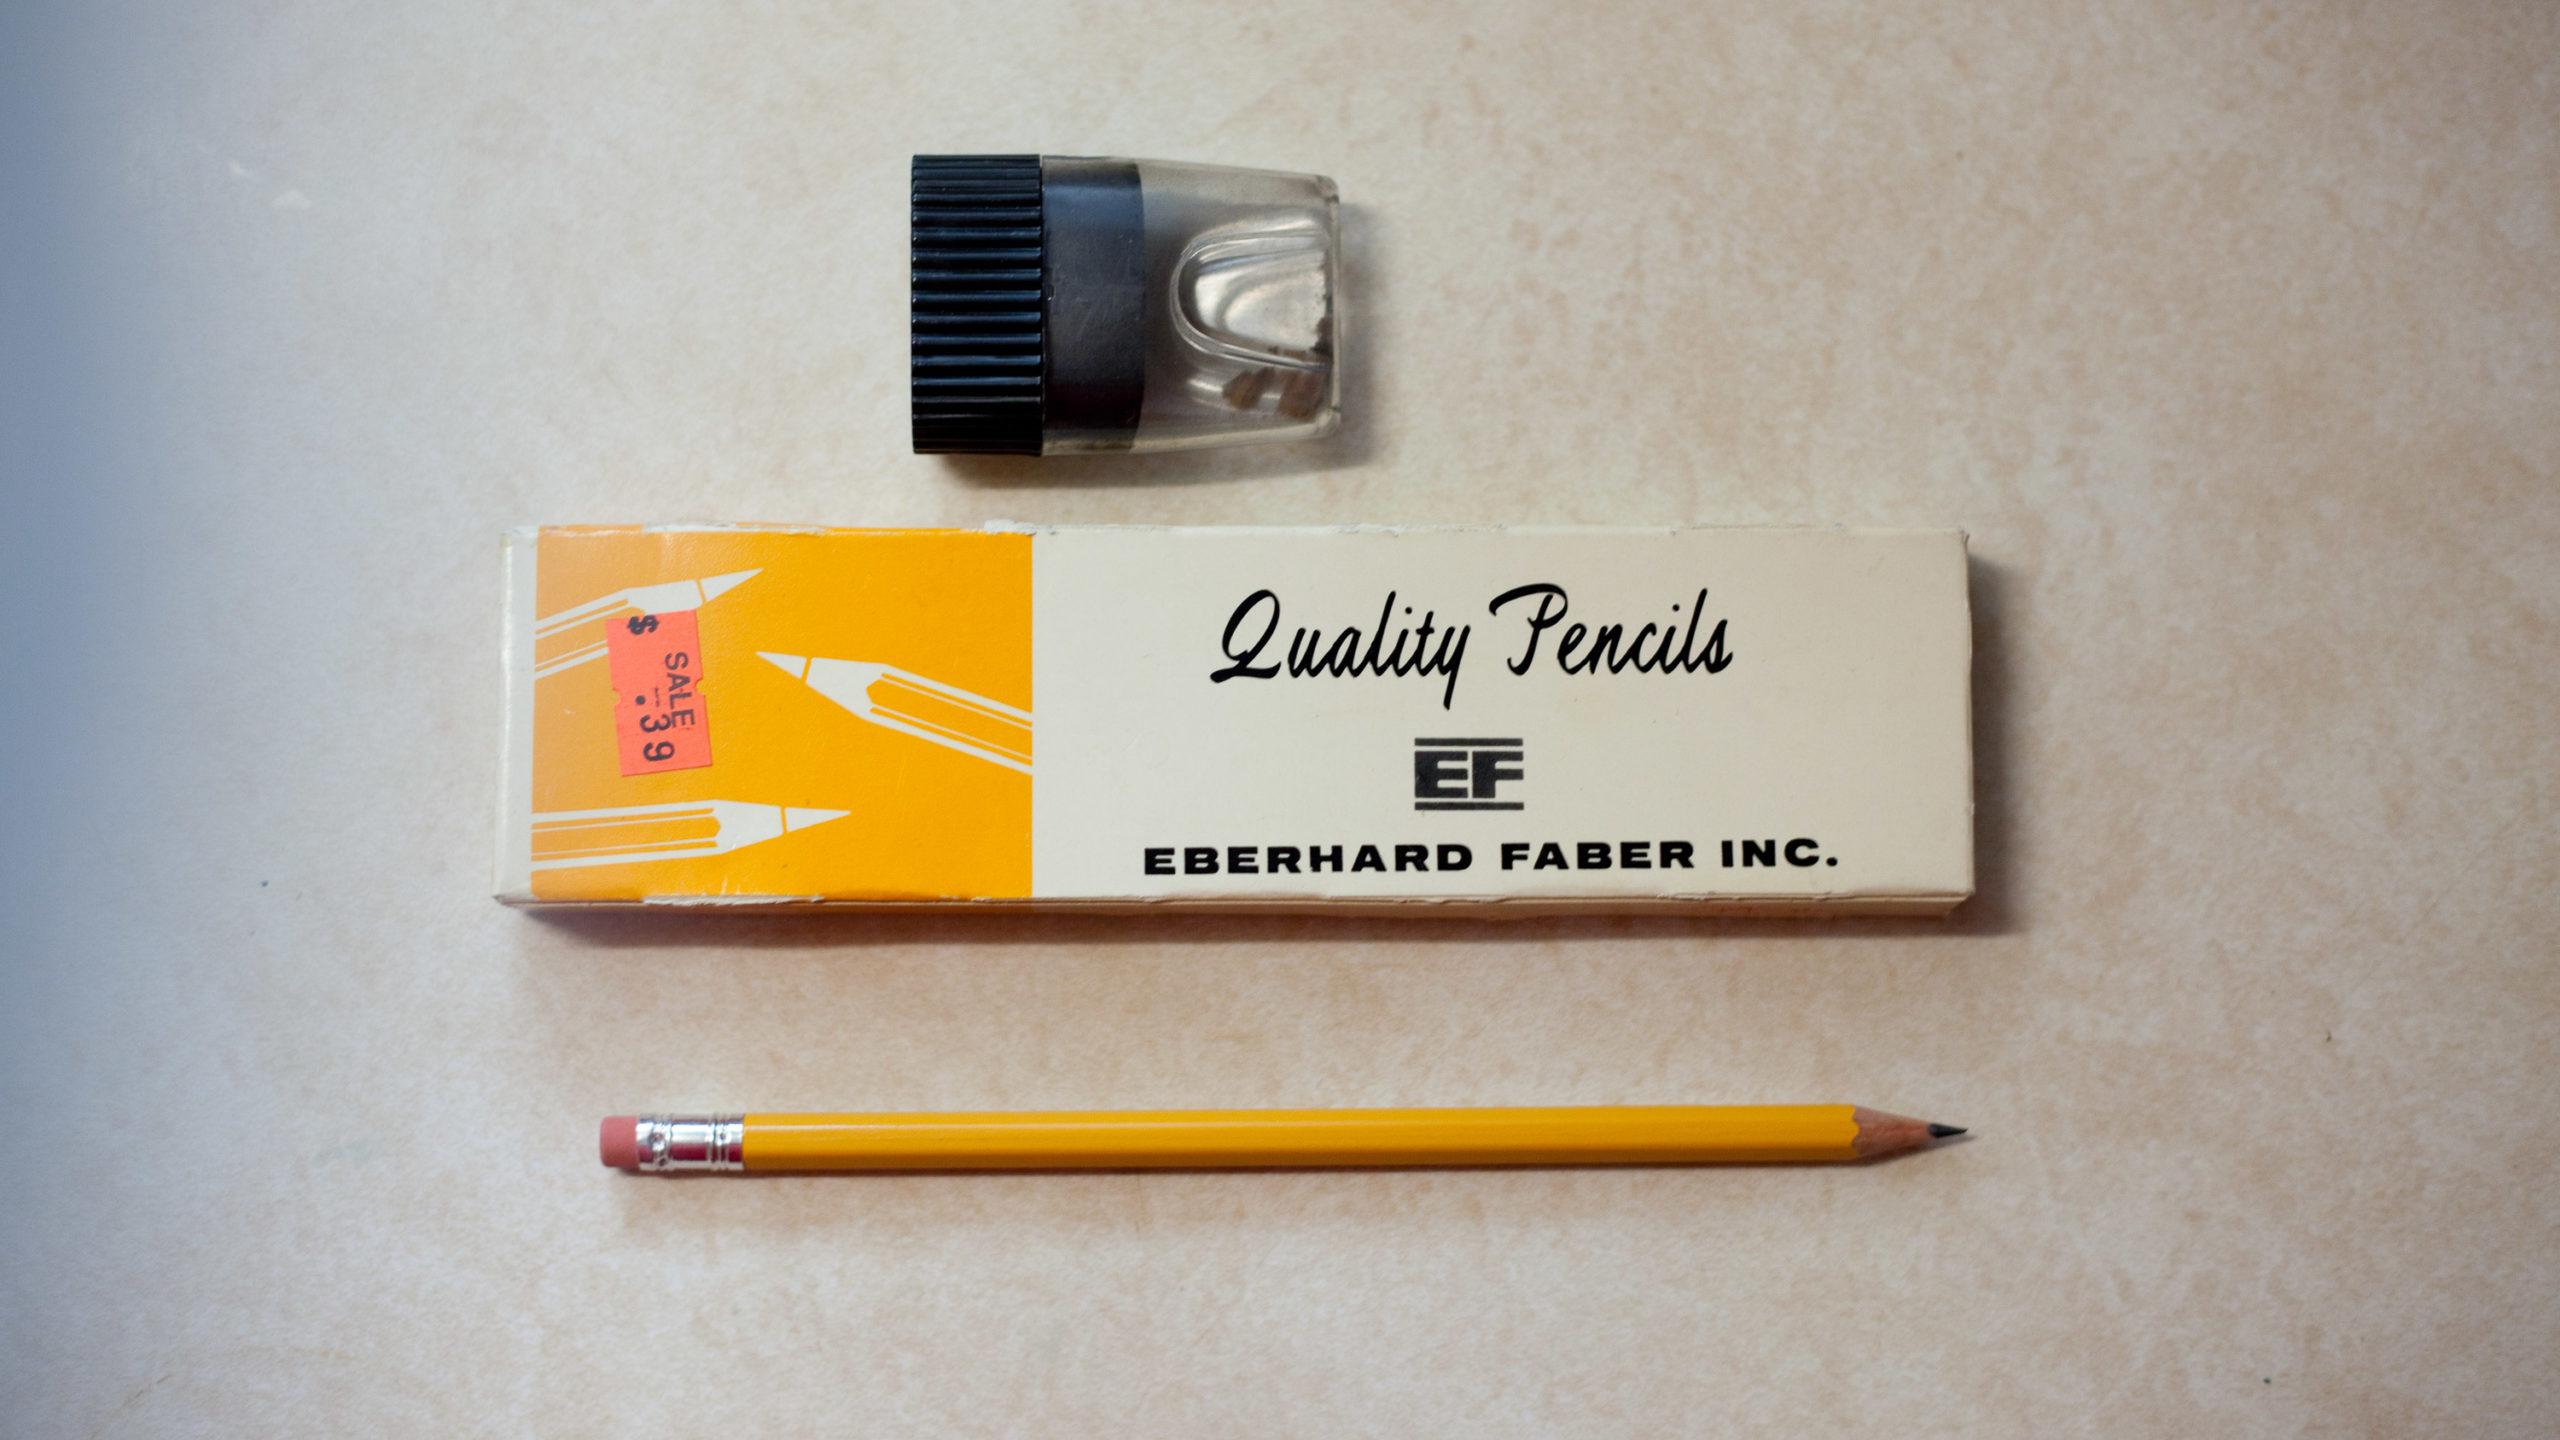 A box of Quality brand pencils, a pencil sharpener, and a pencil